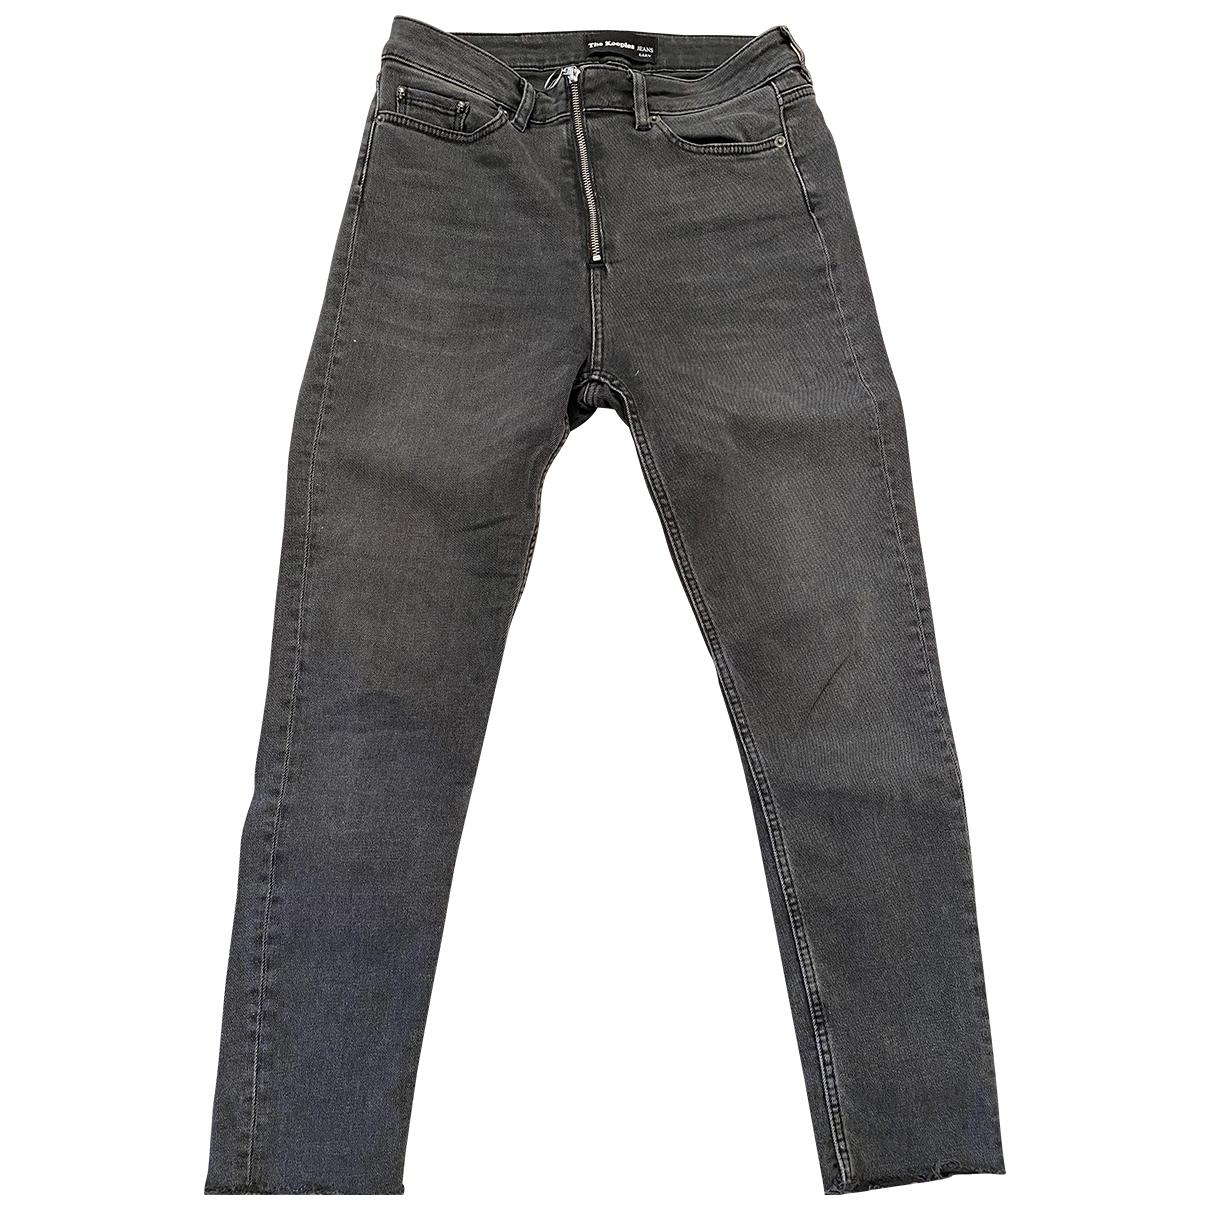 The Kooples \N Grey Denim - Jeans Jeans for Women 38 FR